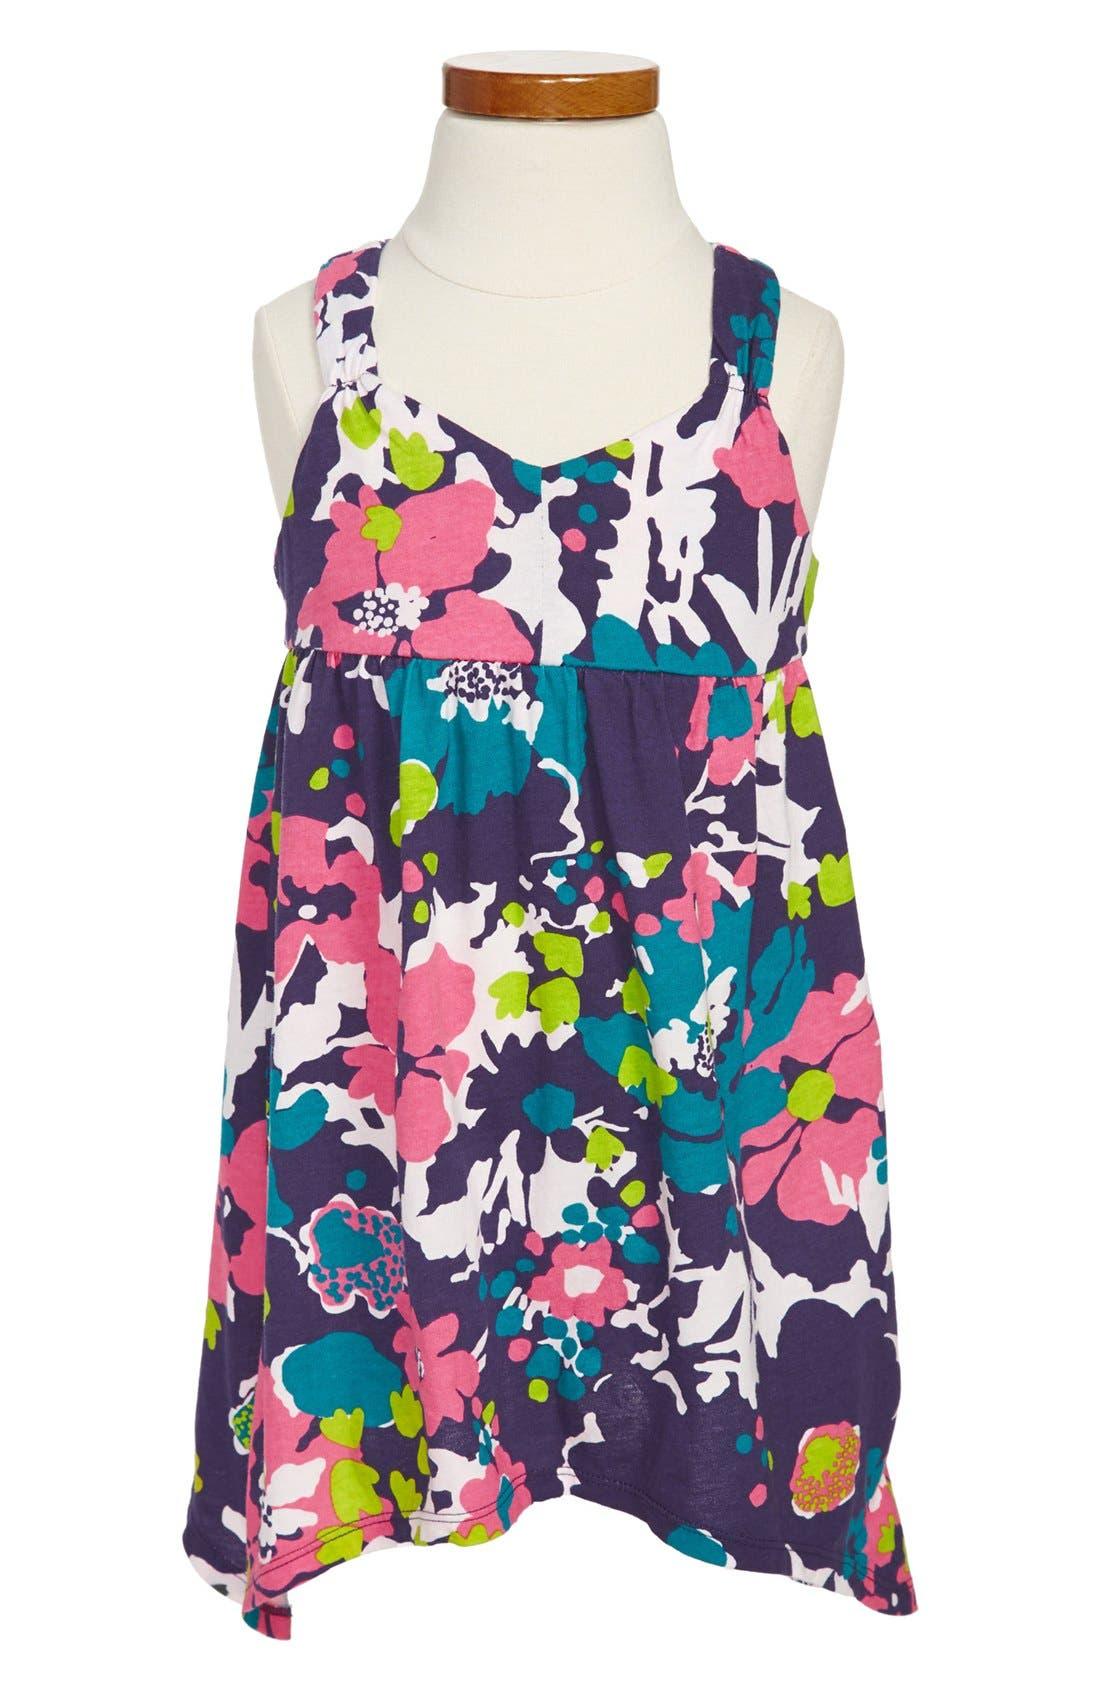 Alternate Image 1 Selected - Roxy 'Bay Hill' Sleeveless Dress (Toddler Girls)